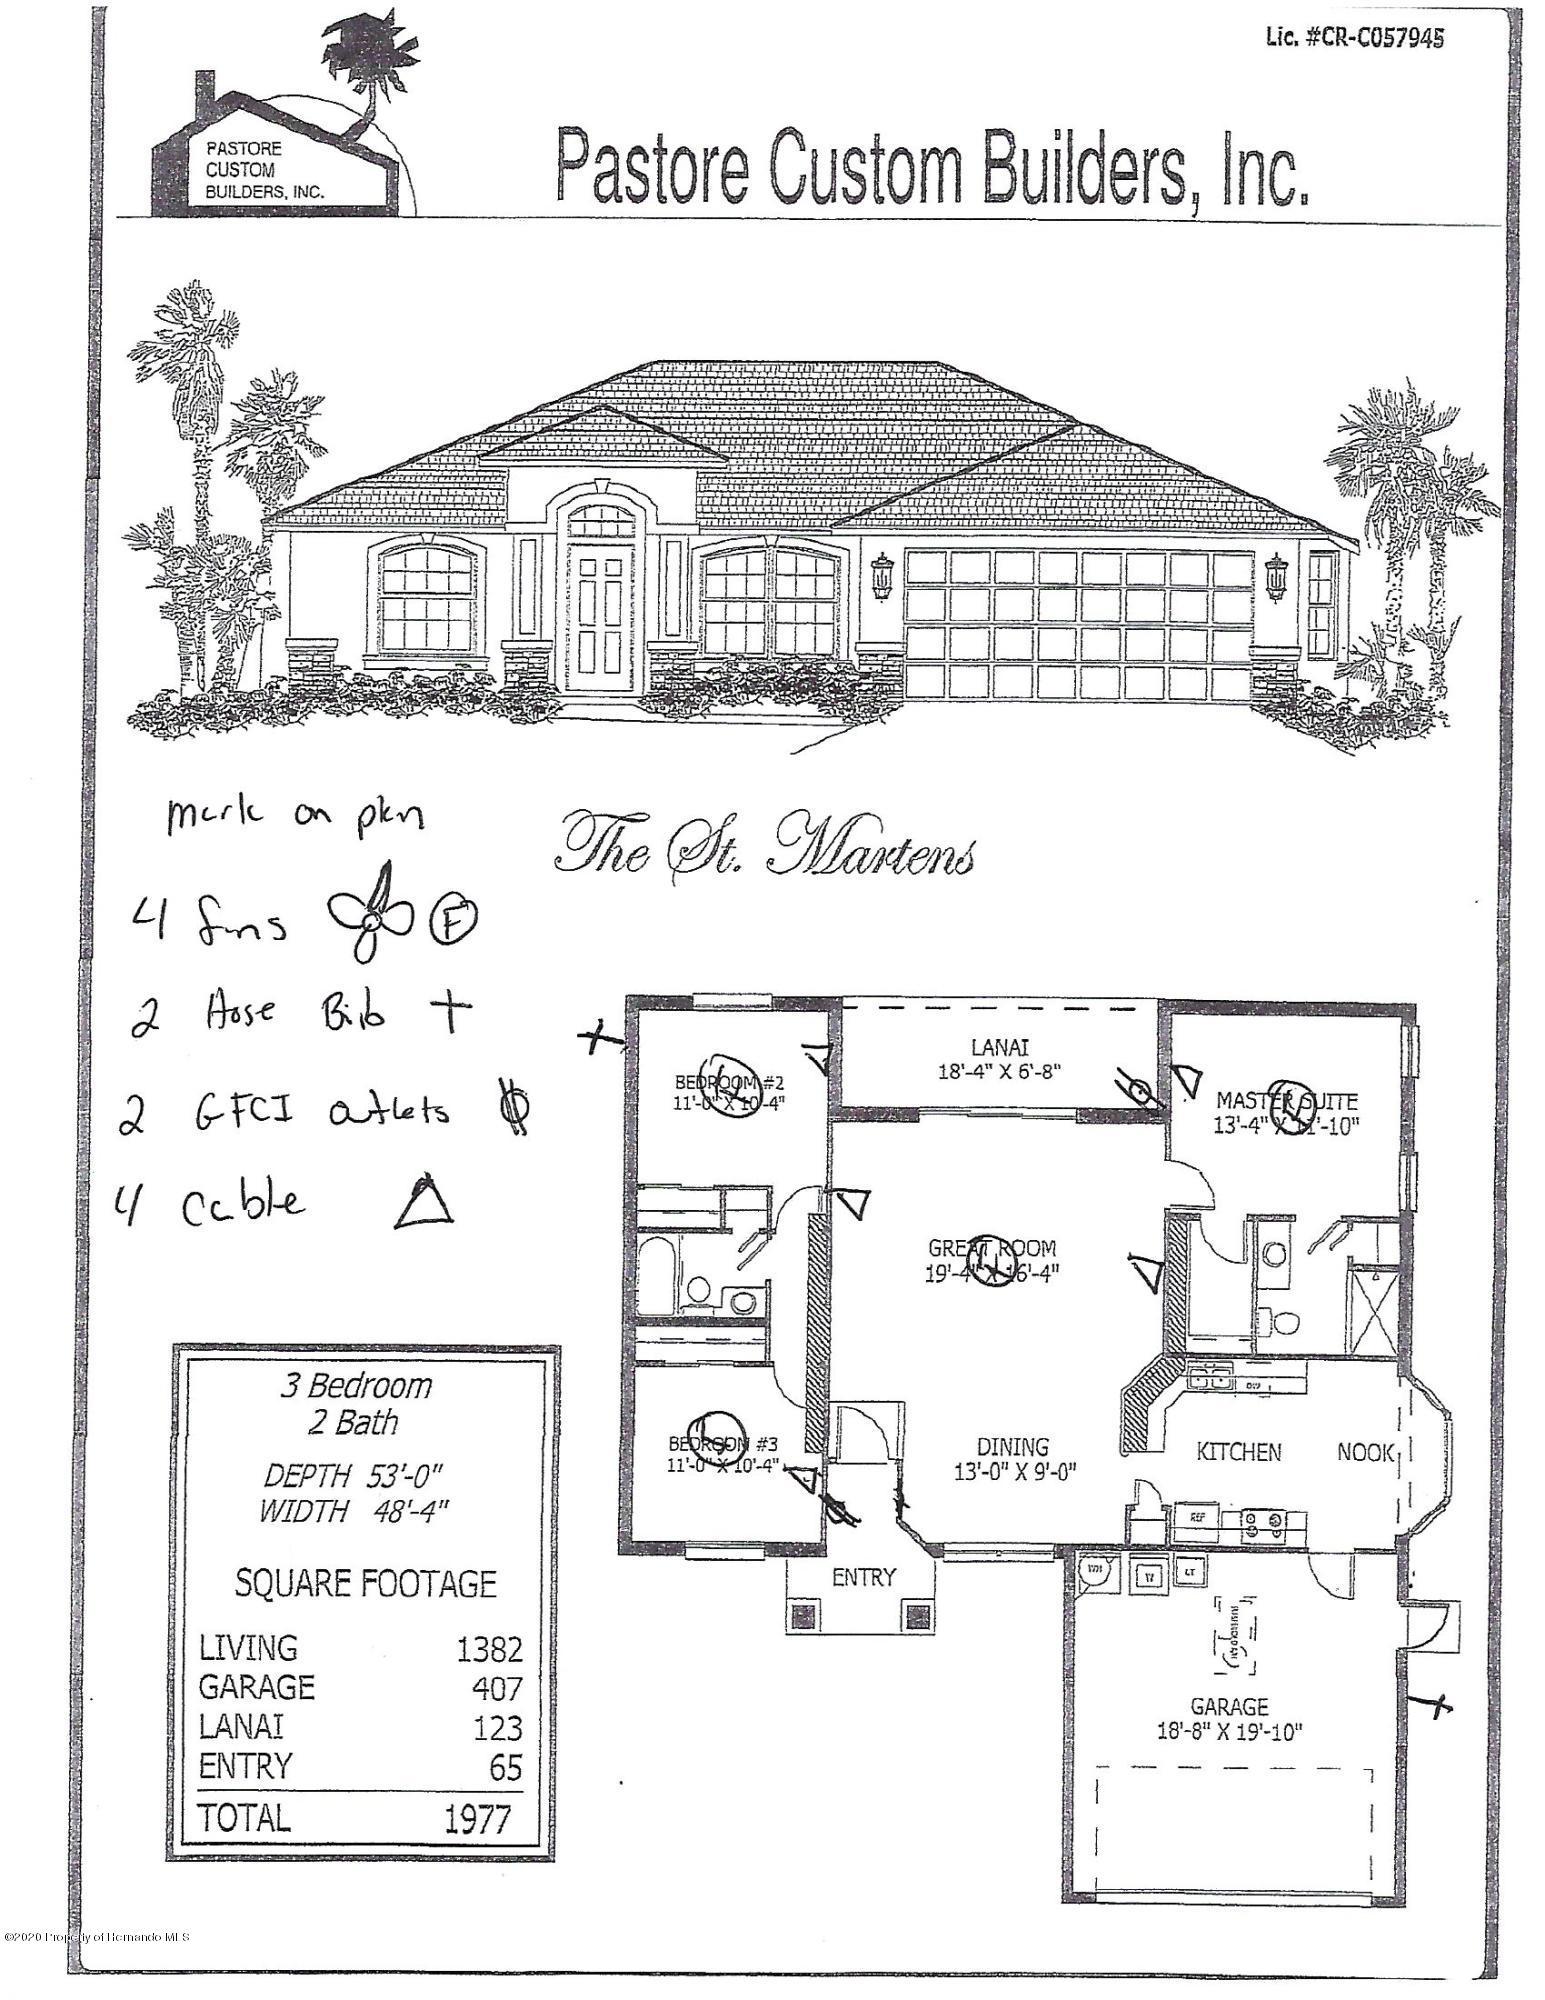 Details for 0 Albany Road, Brooksville, FL 34614